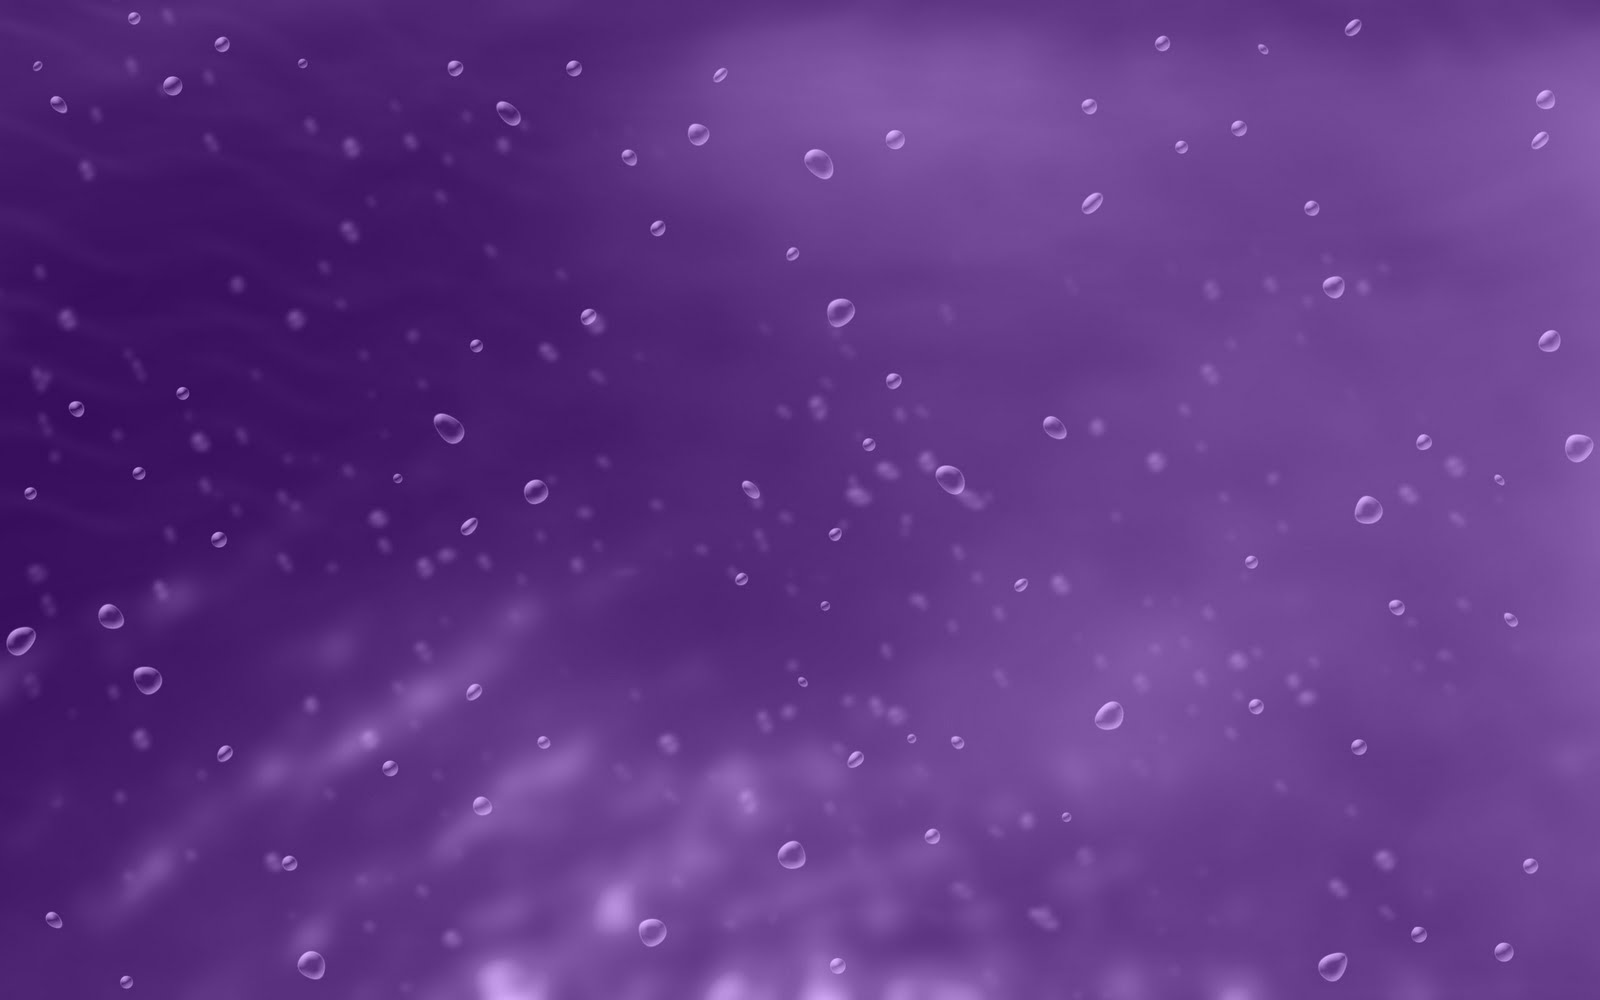 http://4.bp.blogspot.com/_SWYwL3fIkFs/S8VXds86DSI/AAAAAAAAEcM/iTzJTQGnuYI/s1600/water+bubbles+purple.jpg